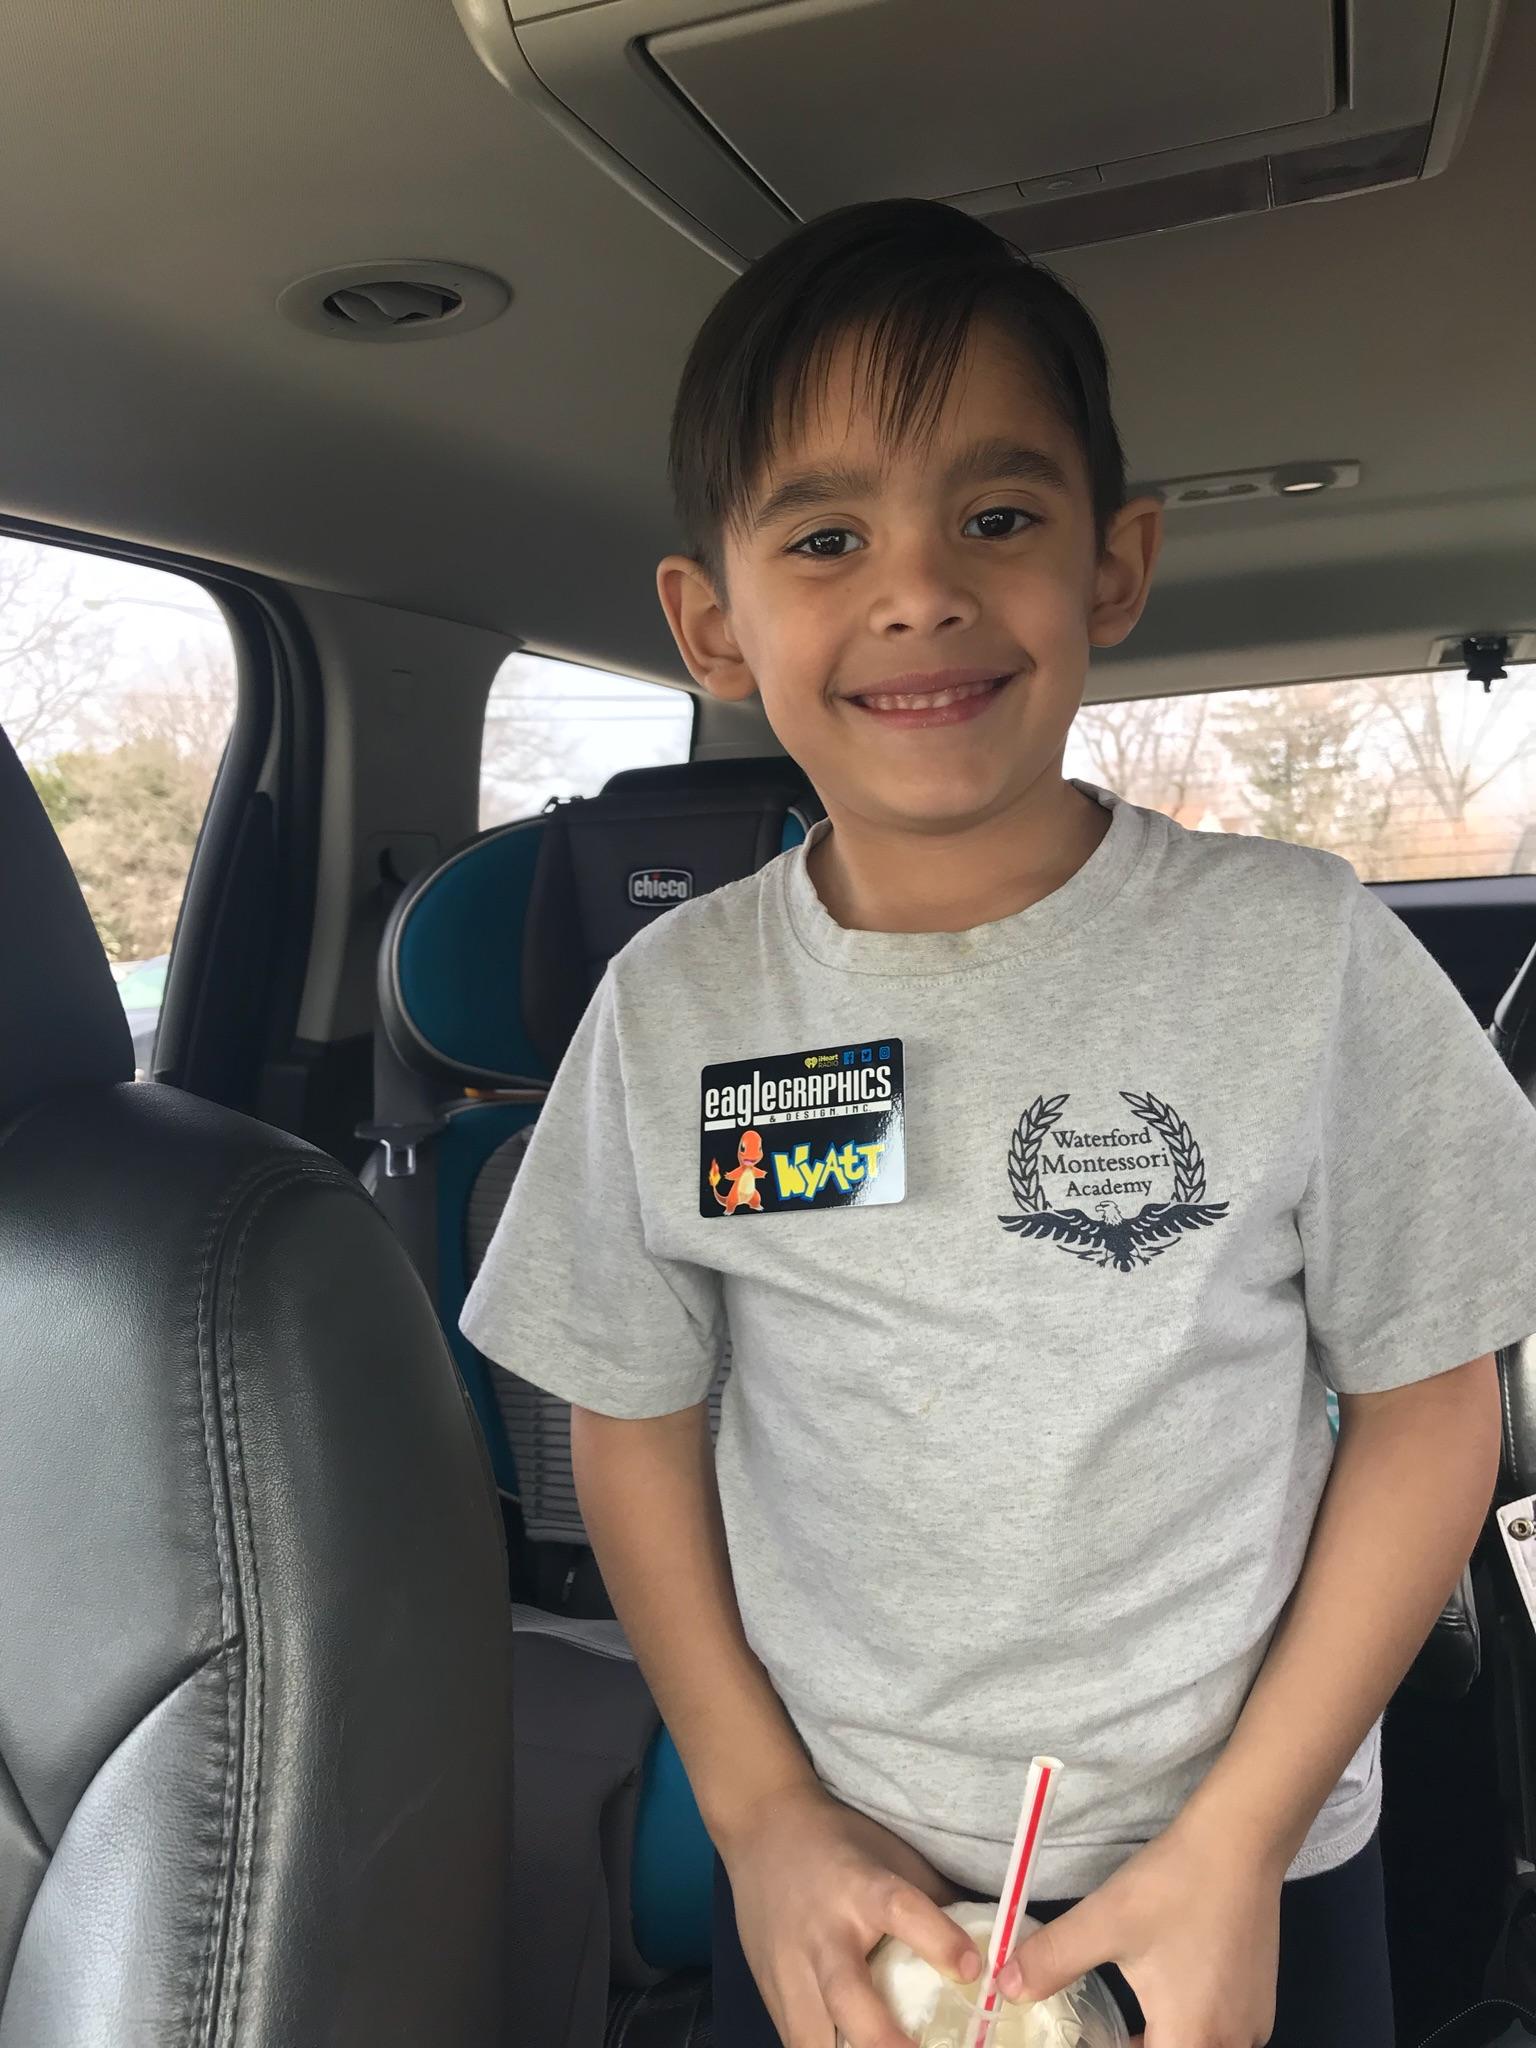 Wyatt loves his new name tag!